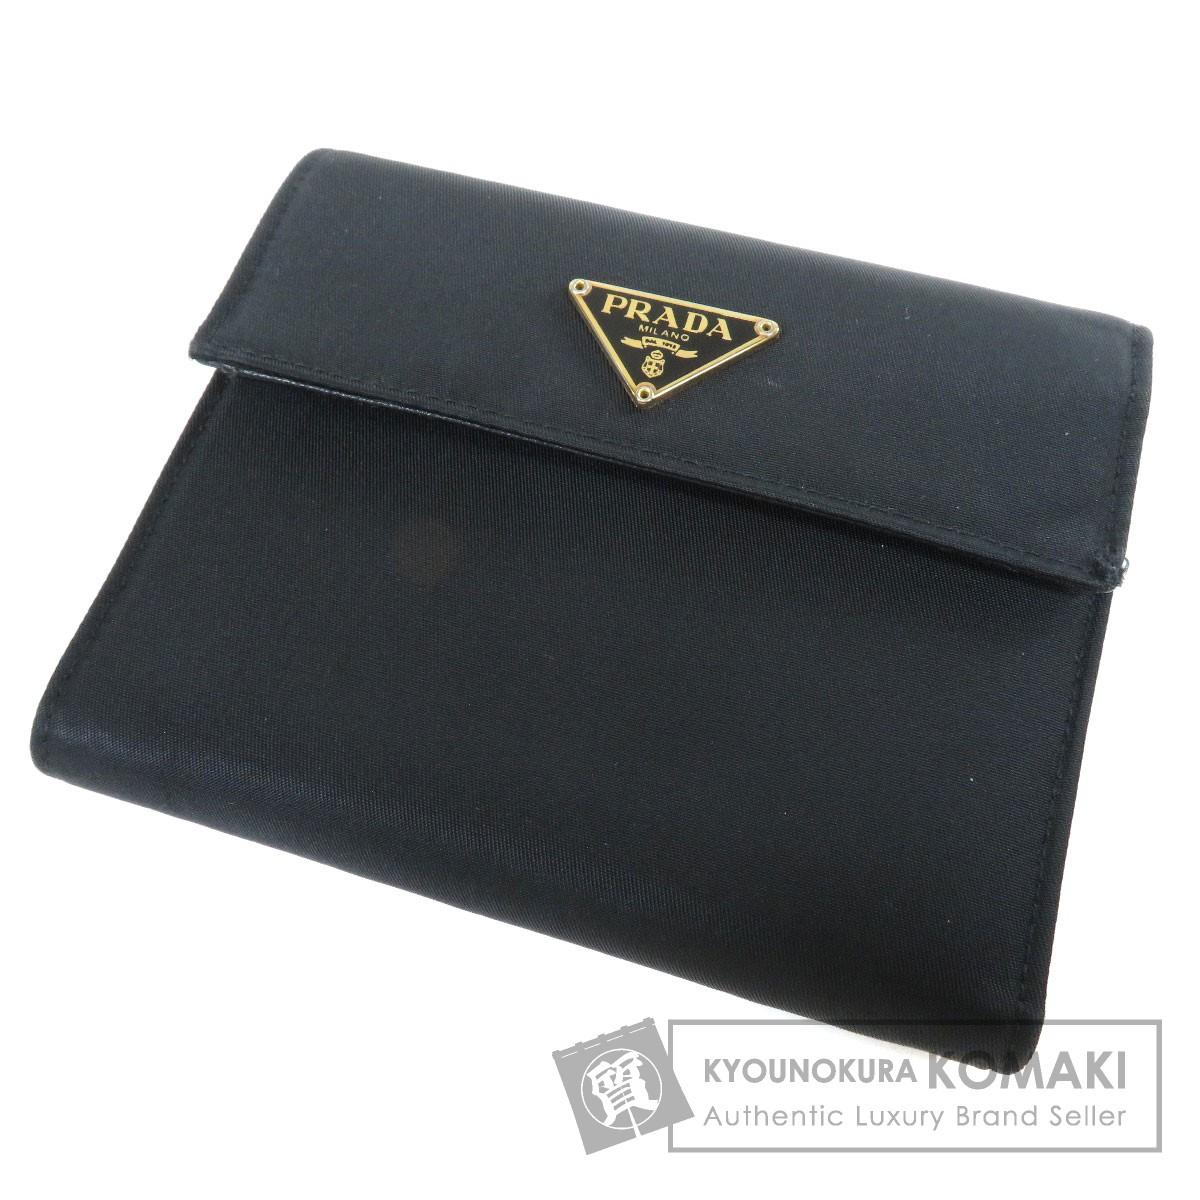 PRADA ロゴプレート 二つ折り財布(小銭入れあり) ナイロン素材 ユニセックス 【中古】【プラダ】